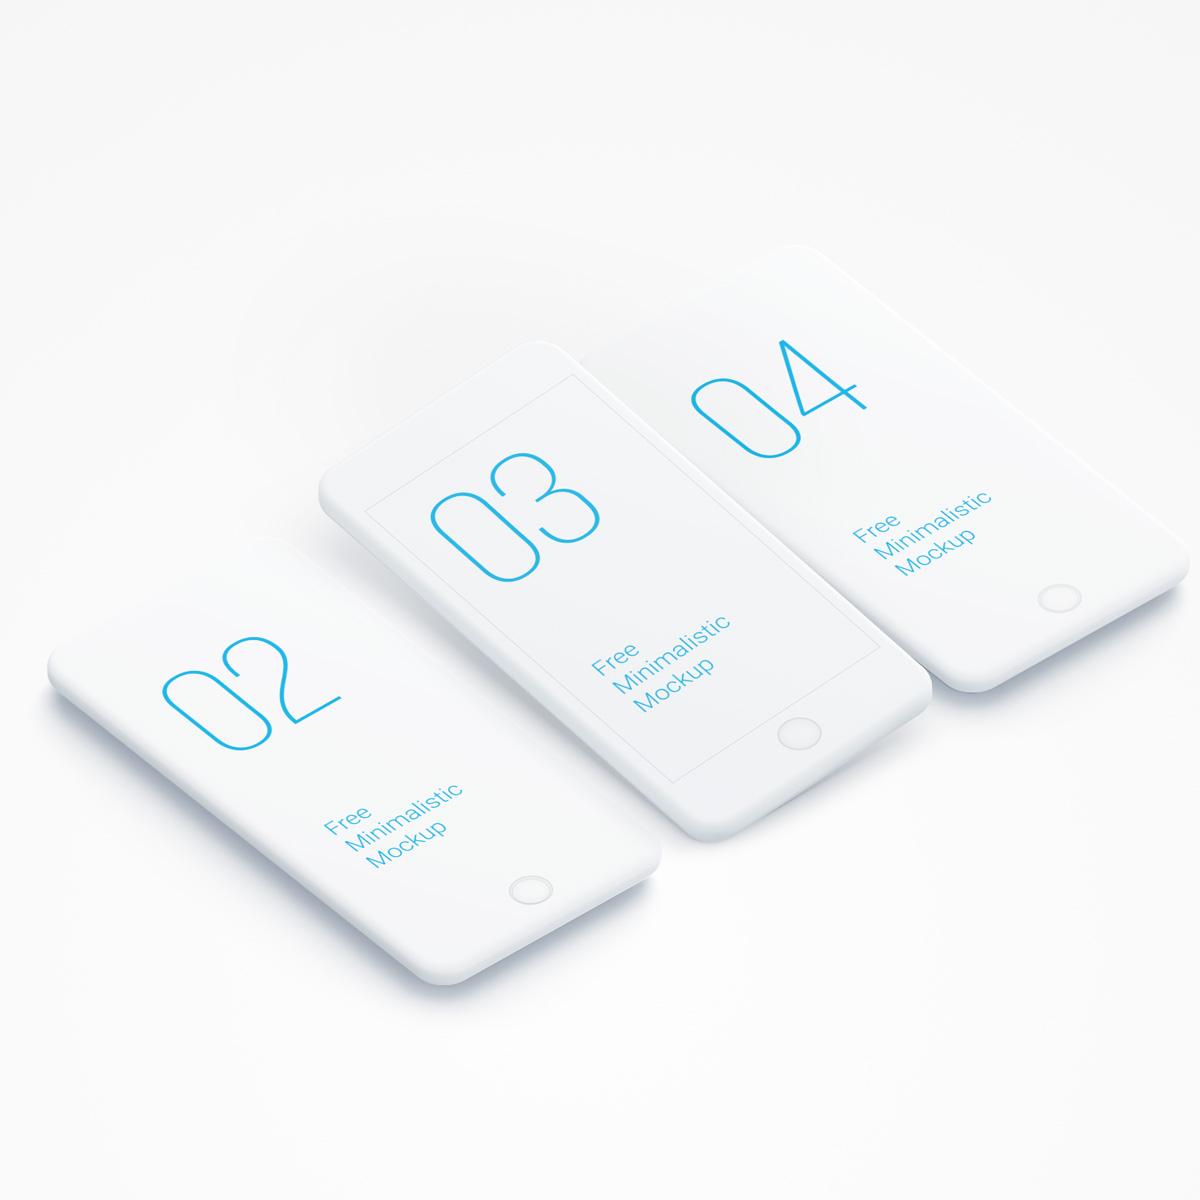 app-project-02-2